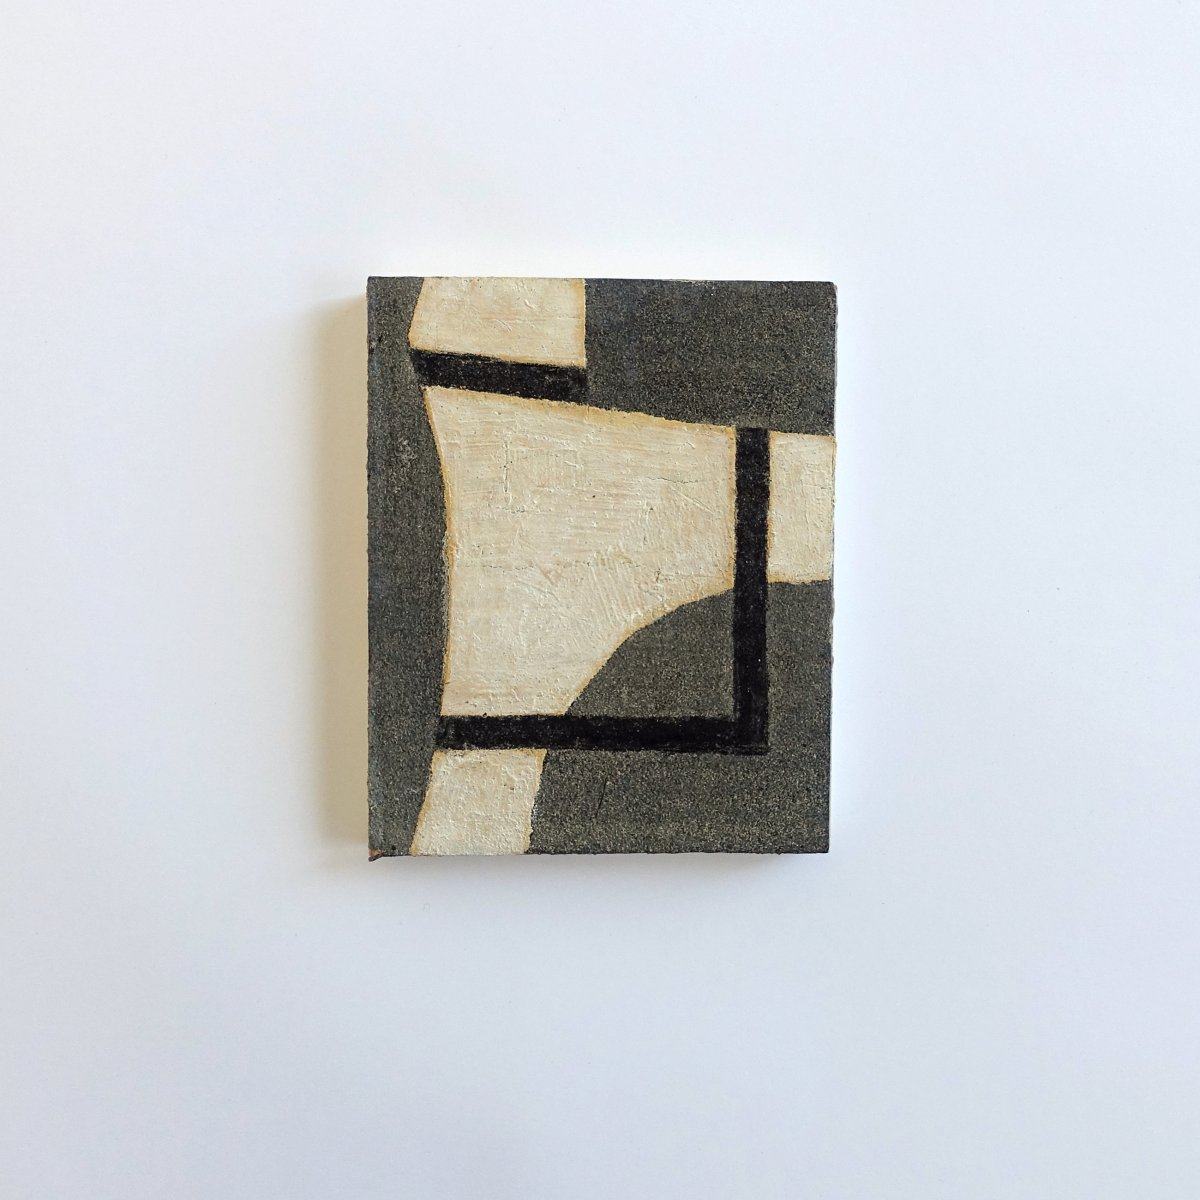 #3 Hans Emmelkamp, Struttura (1), olieverf op mastiek, 15,5 x 12,3 cm